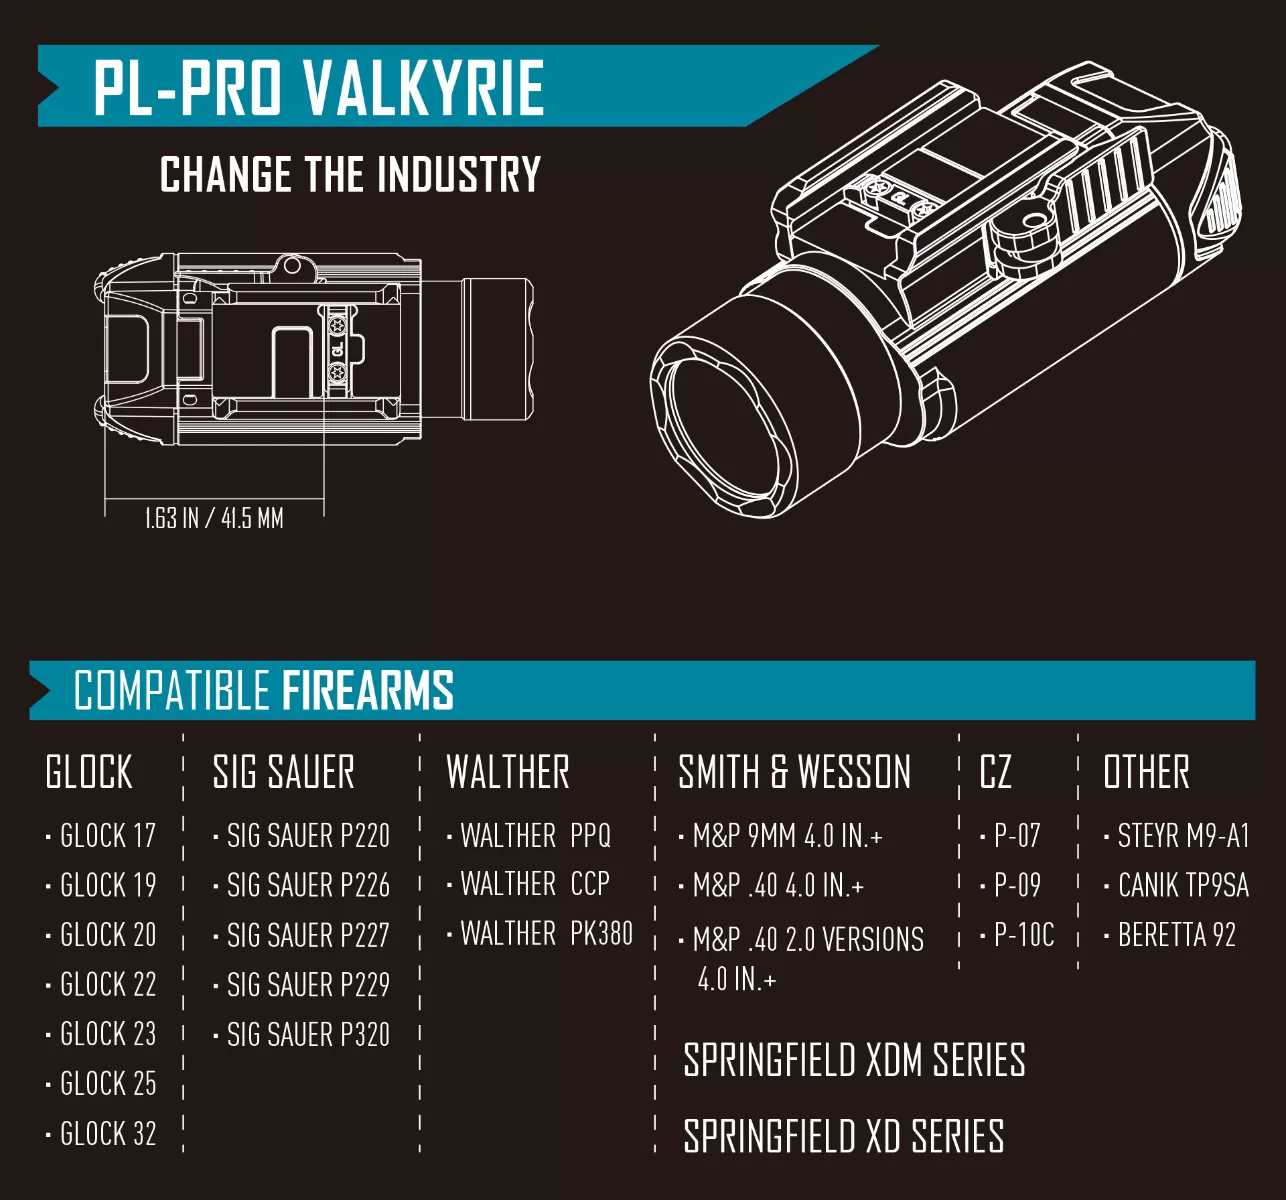 PL-Pro Valkyrie compatible equipment